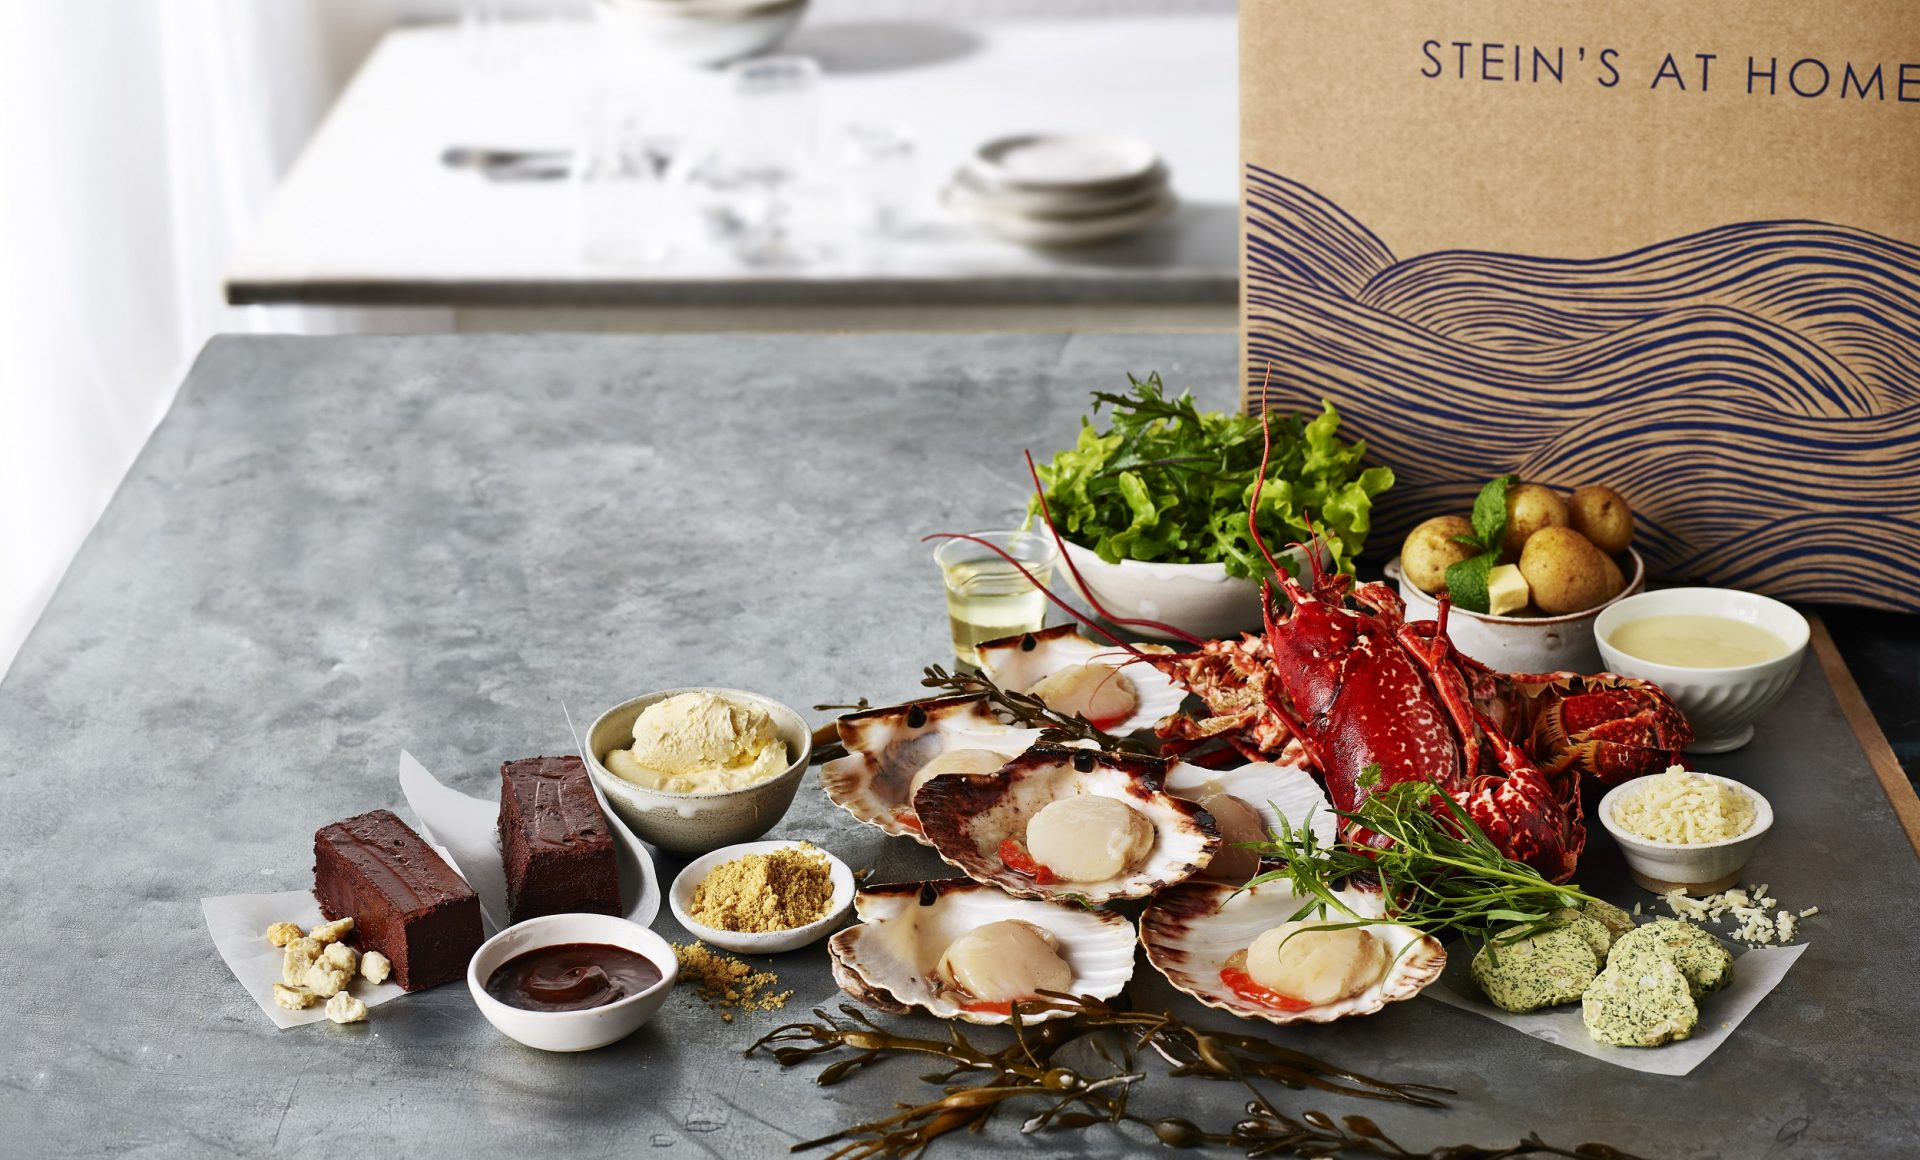 Steins-at-Home-Lobster-Box-Ingredients-JAMES-MURPHY